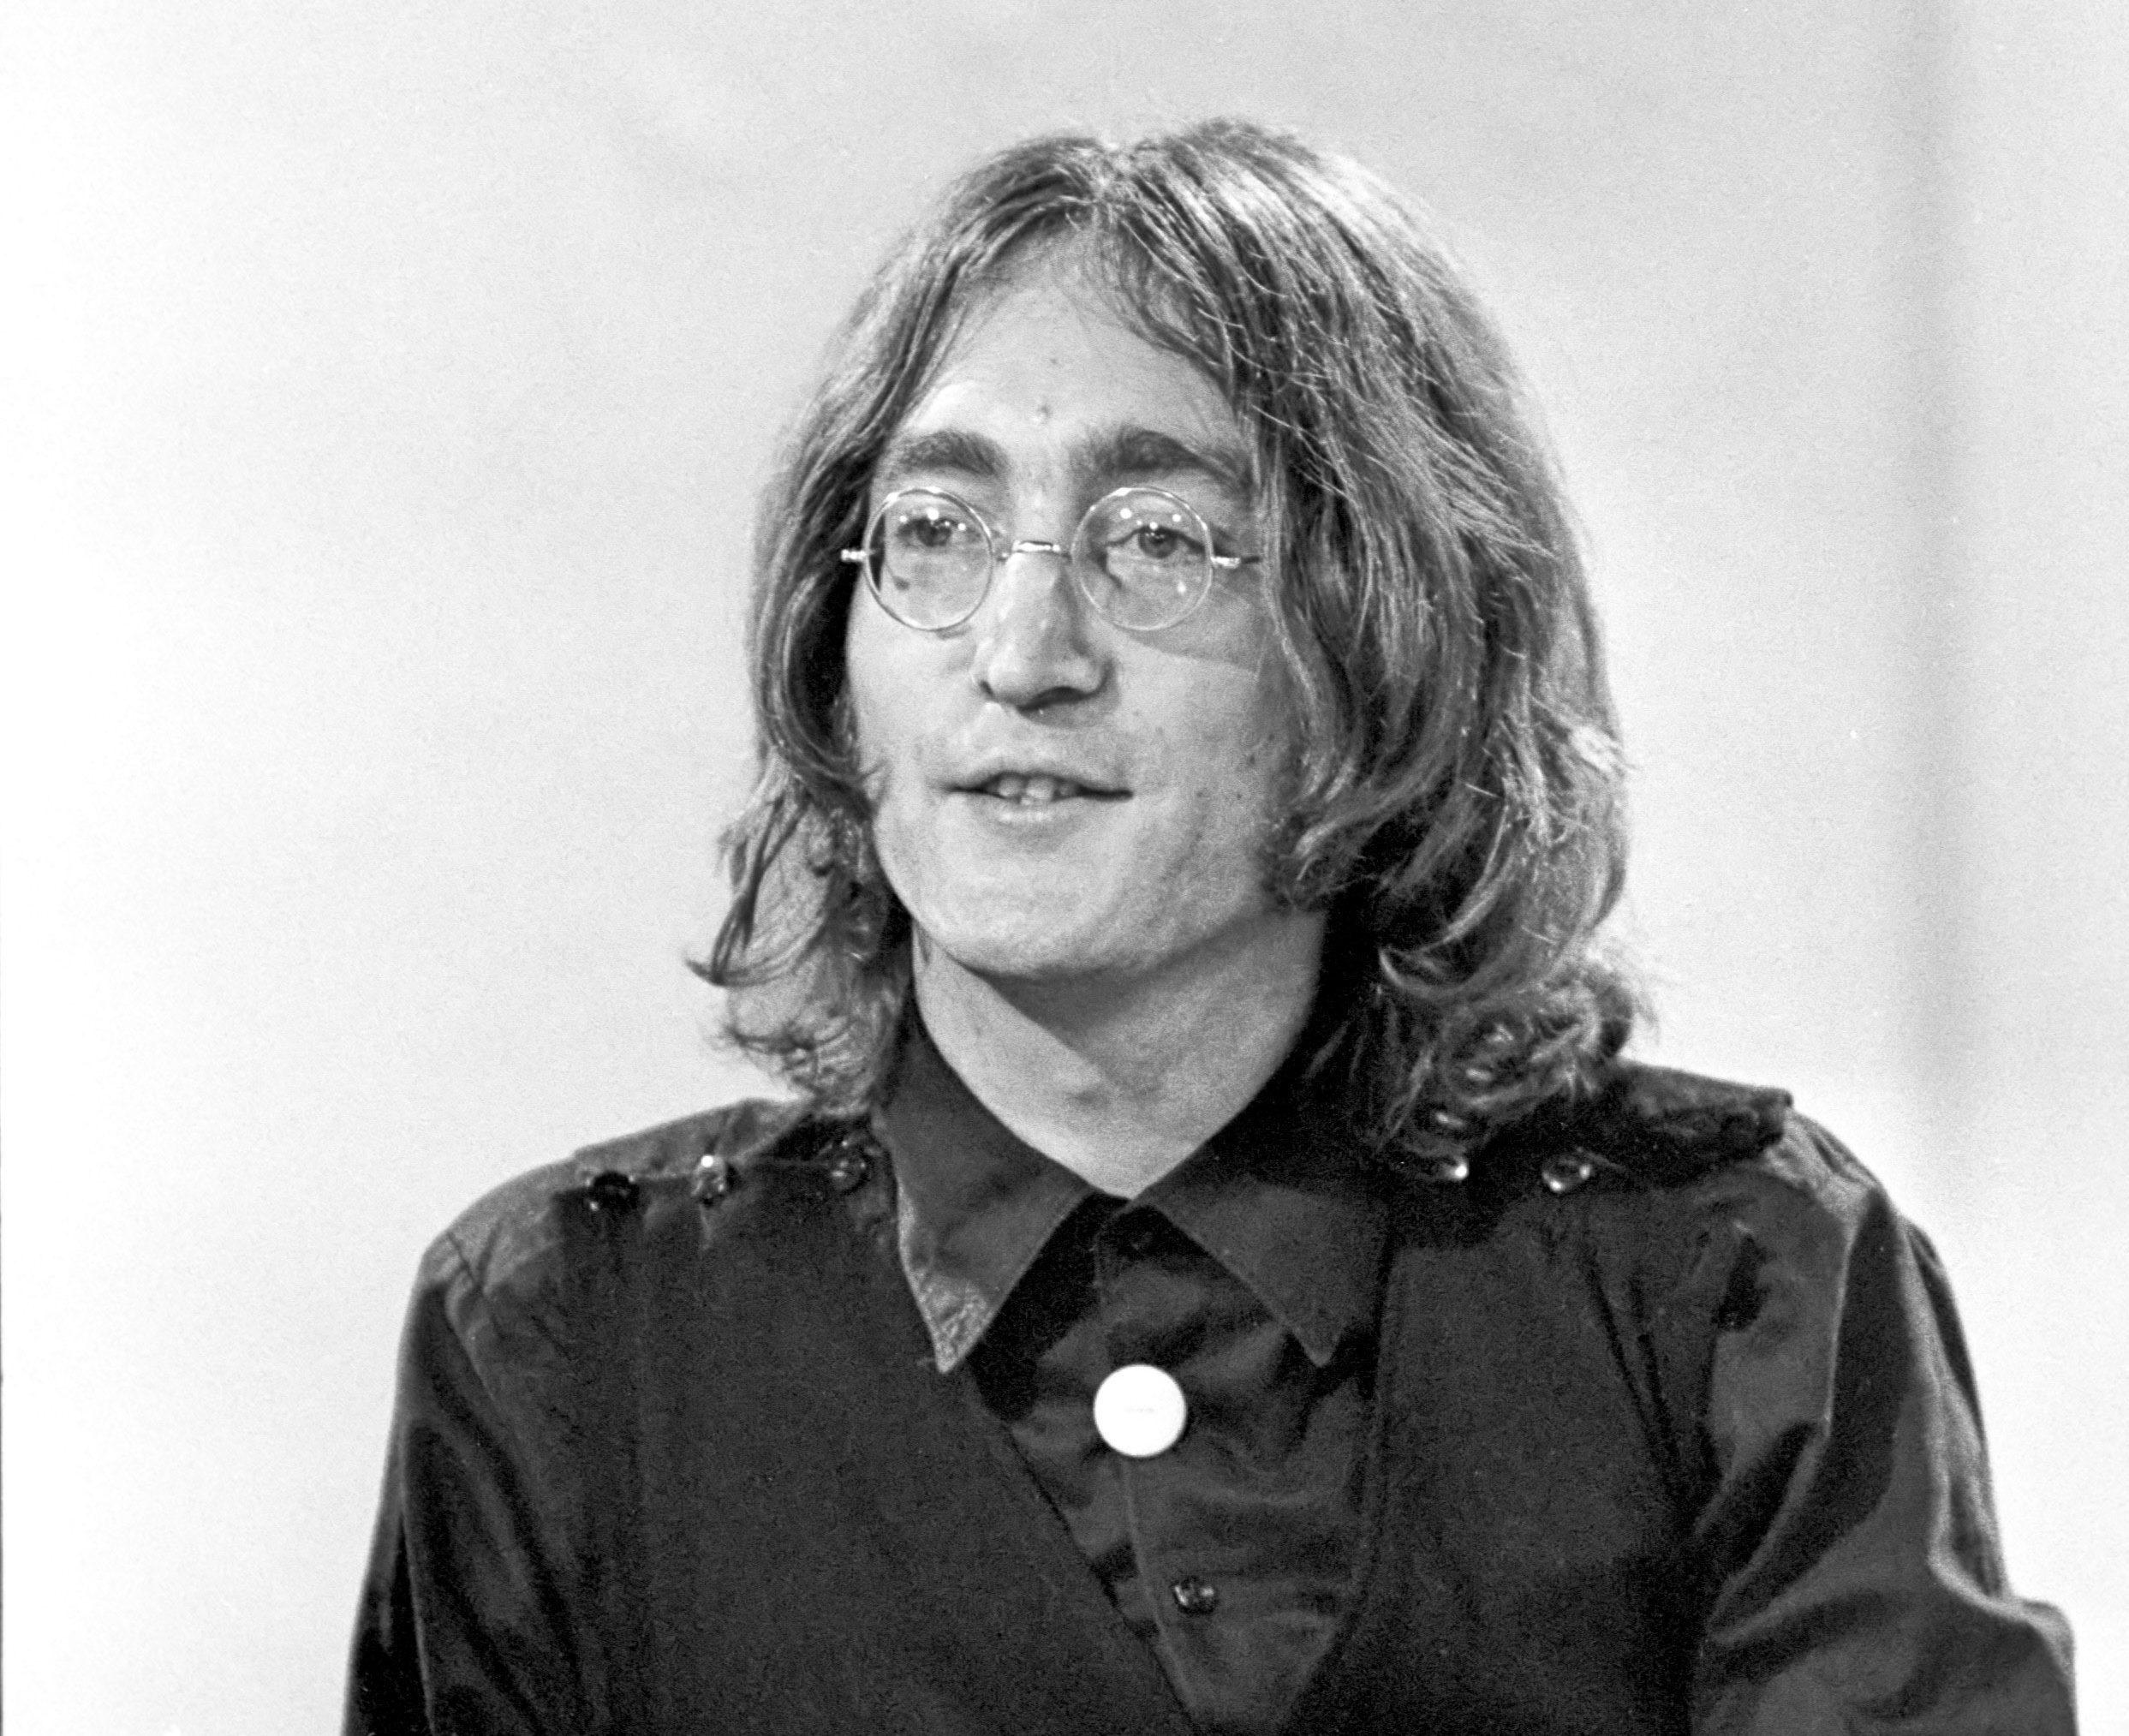 Mandatory Credit: Photo by Shutterstock (524008o) 'Frost on Saturday' TV programme - John Lennon - 24 Aug 1968 JOHN LENNON